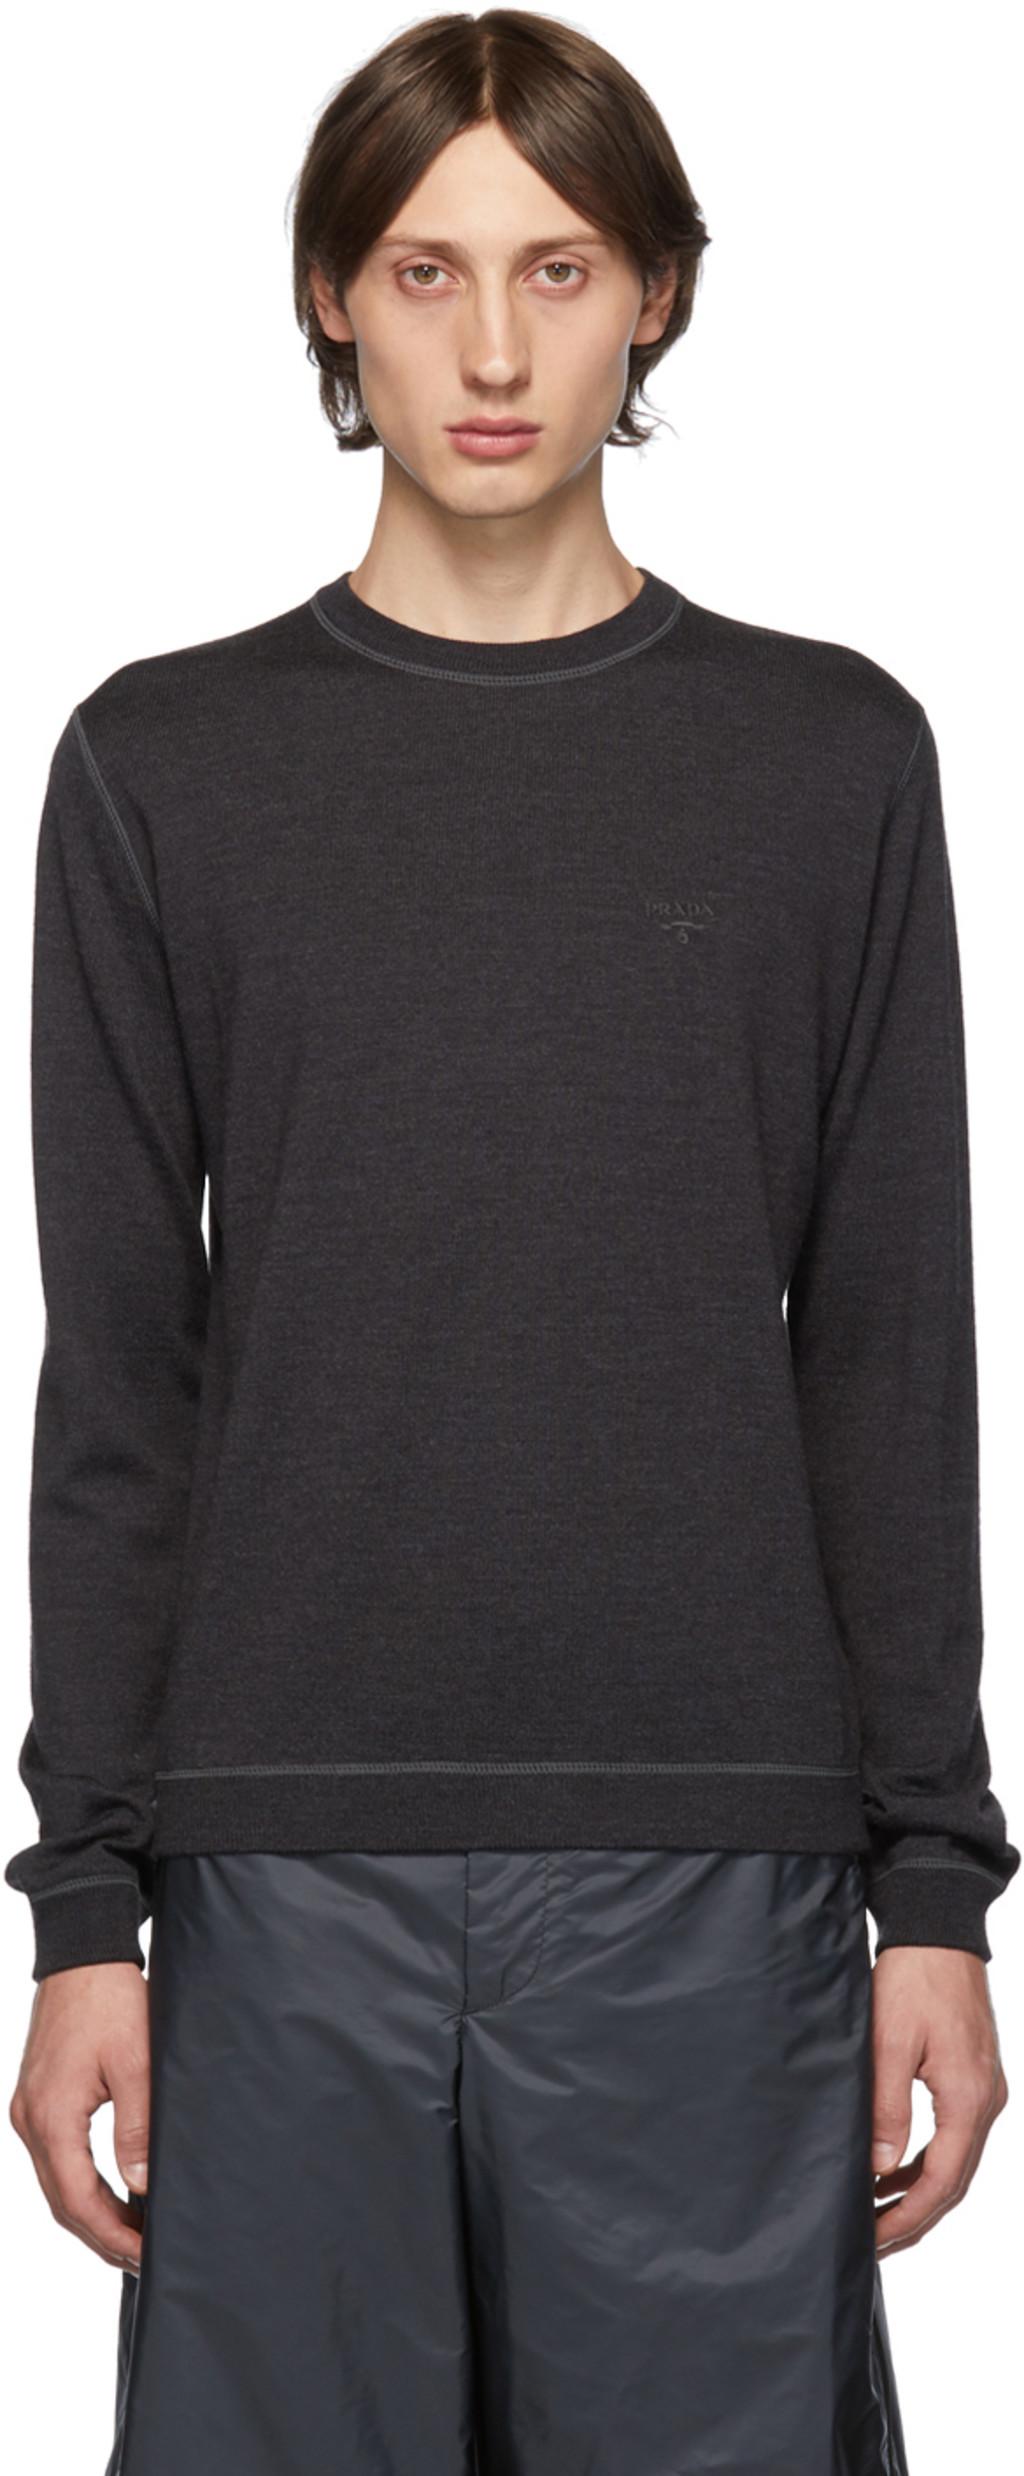 5a6b6fd63d Grey Wool Crewneck Sweater